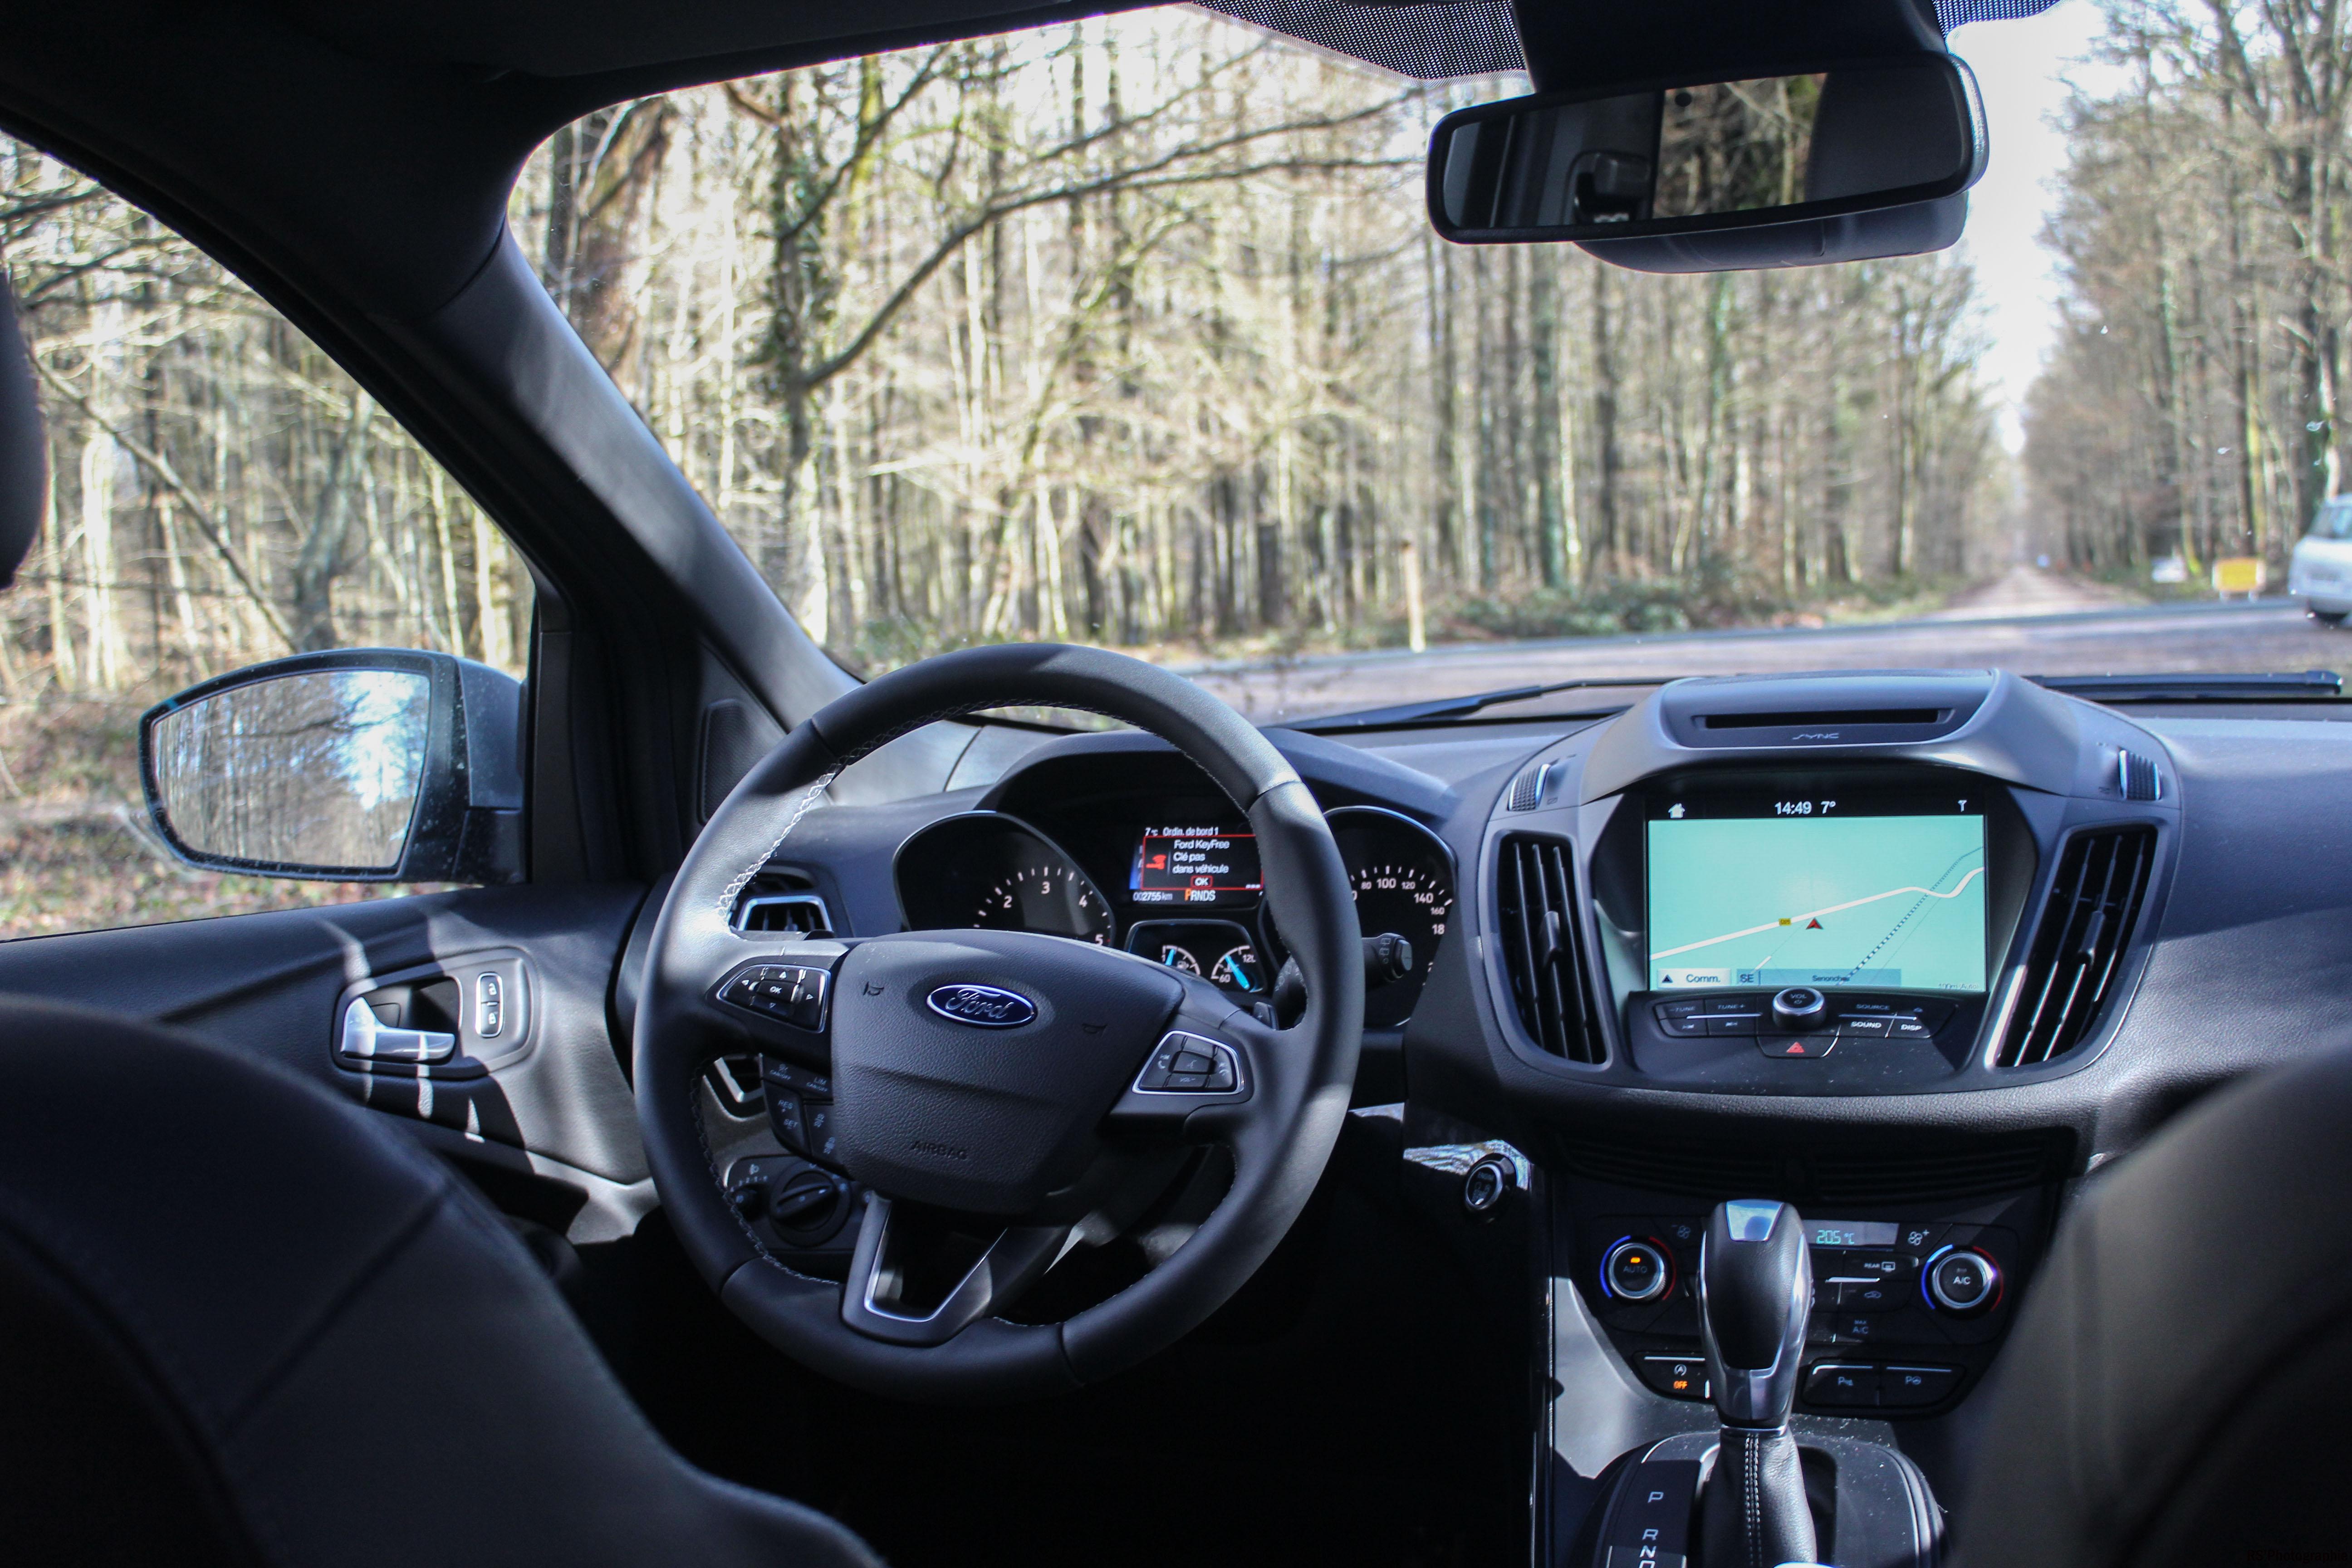 FordKuga22-ford-kuga-150-intérieur-onboard-arnaud-demasier-rsphotographie